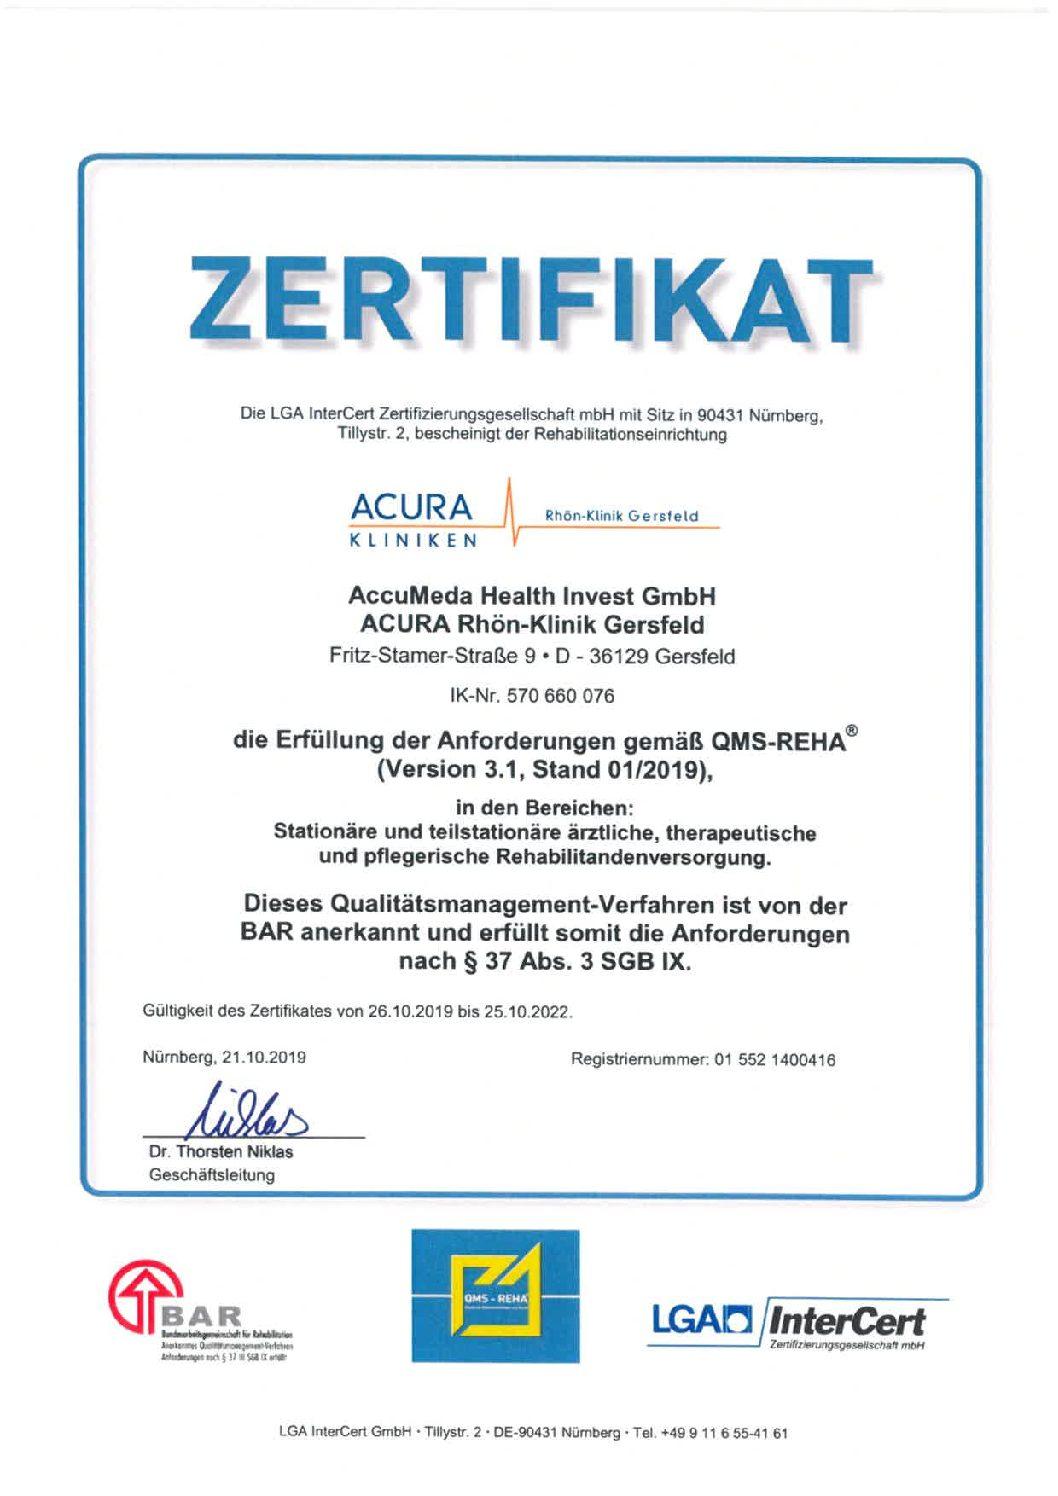 Erste Rehaklinik in Hessen: Rezertifiziert nach QMS-Reha 3.1